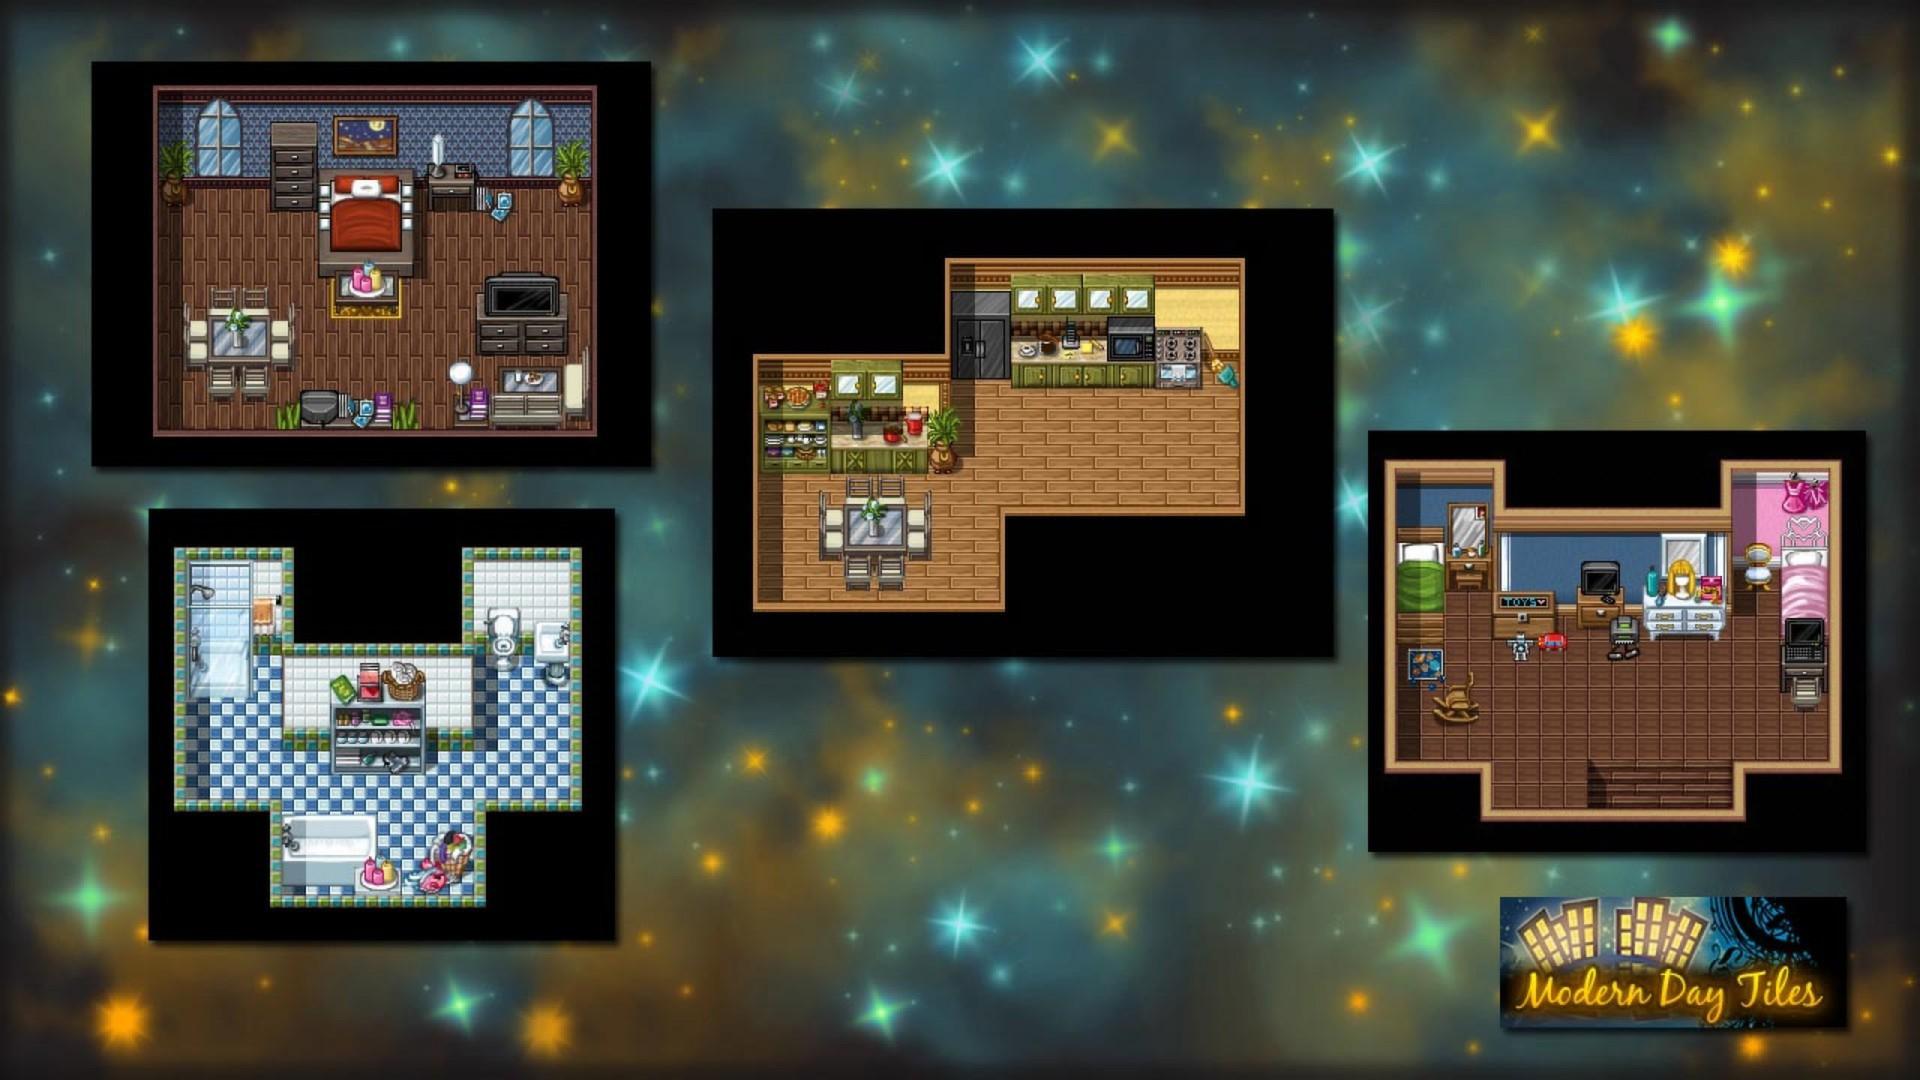 Rpg maker vx ace modern day tiles resource pack for Apartment 412 rpg maker fes